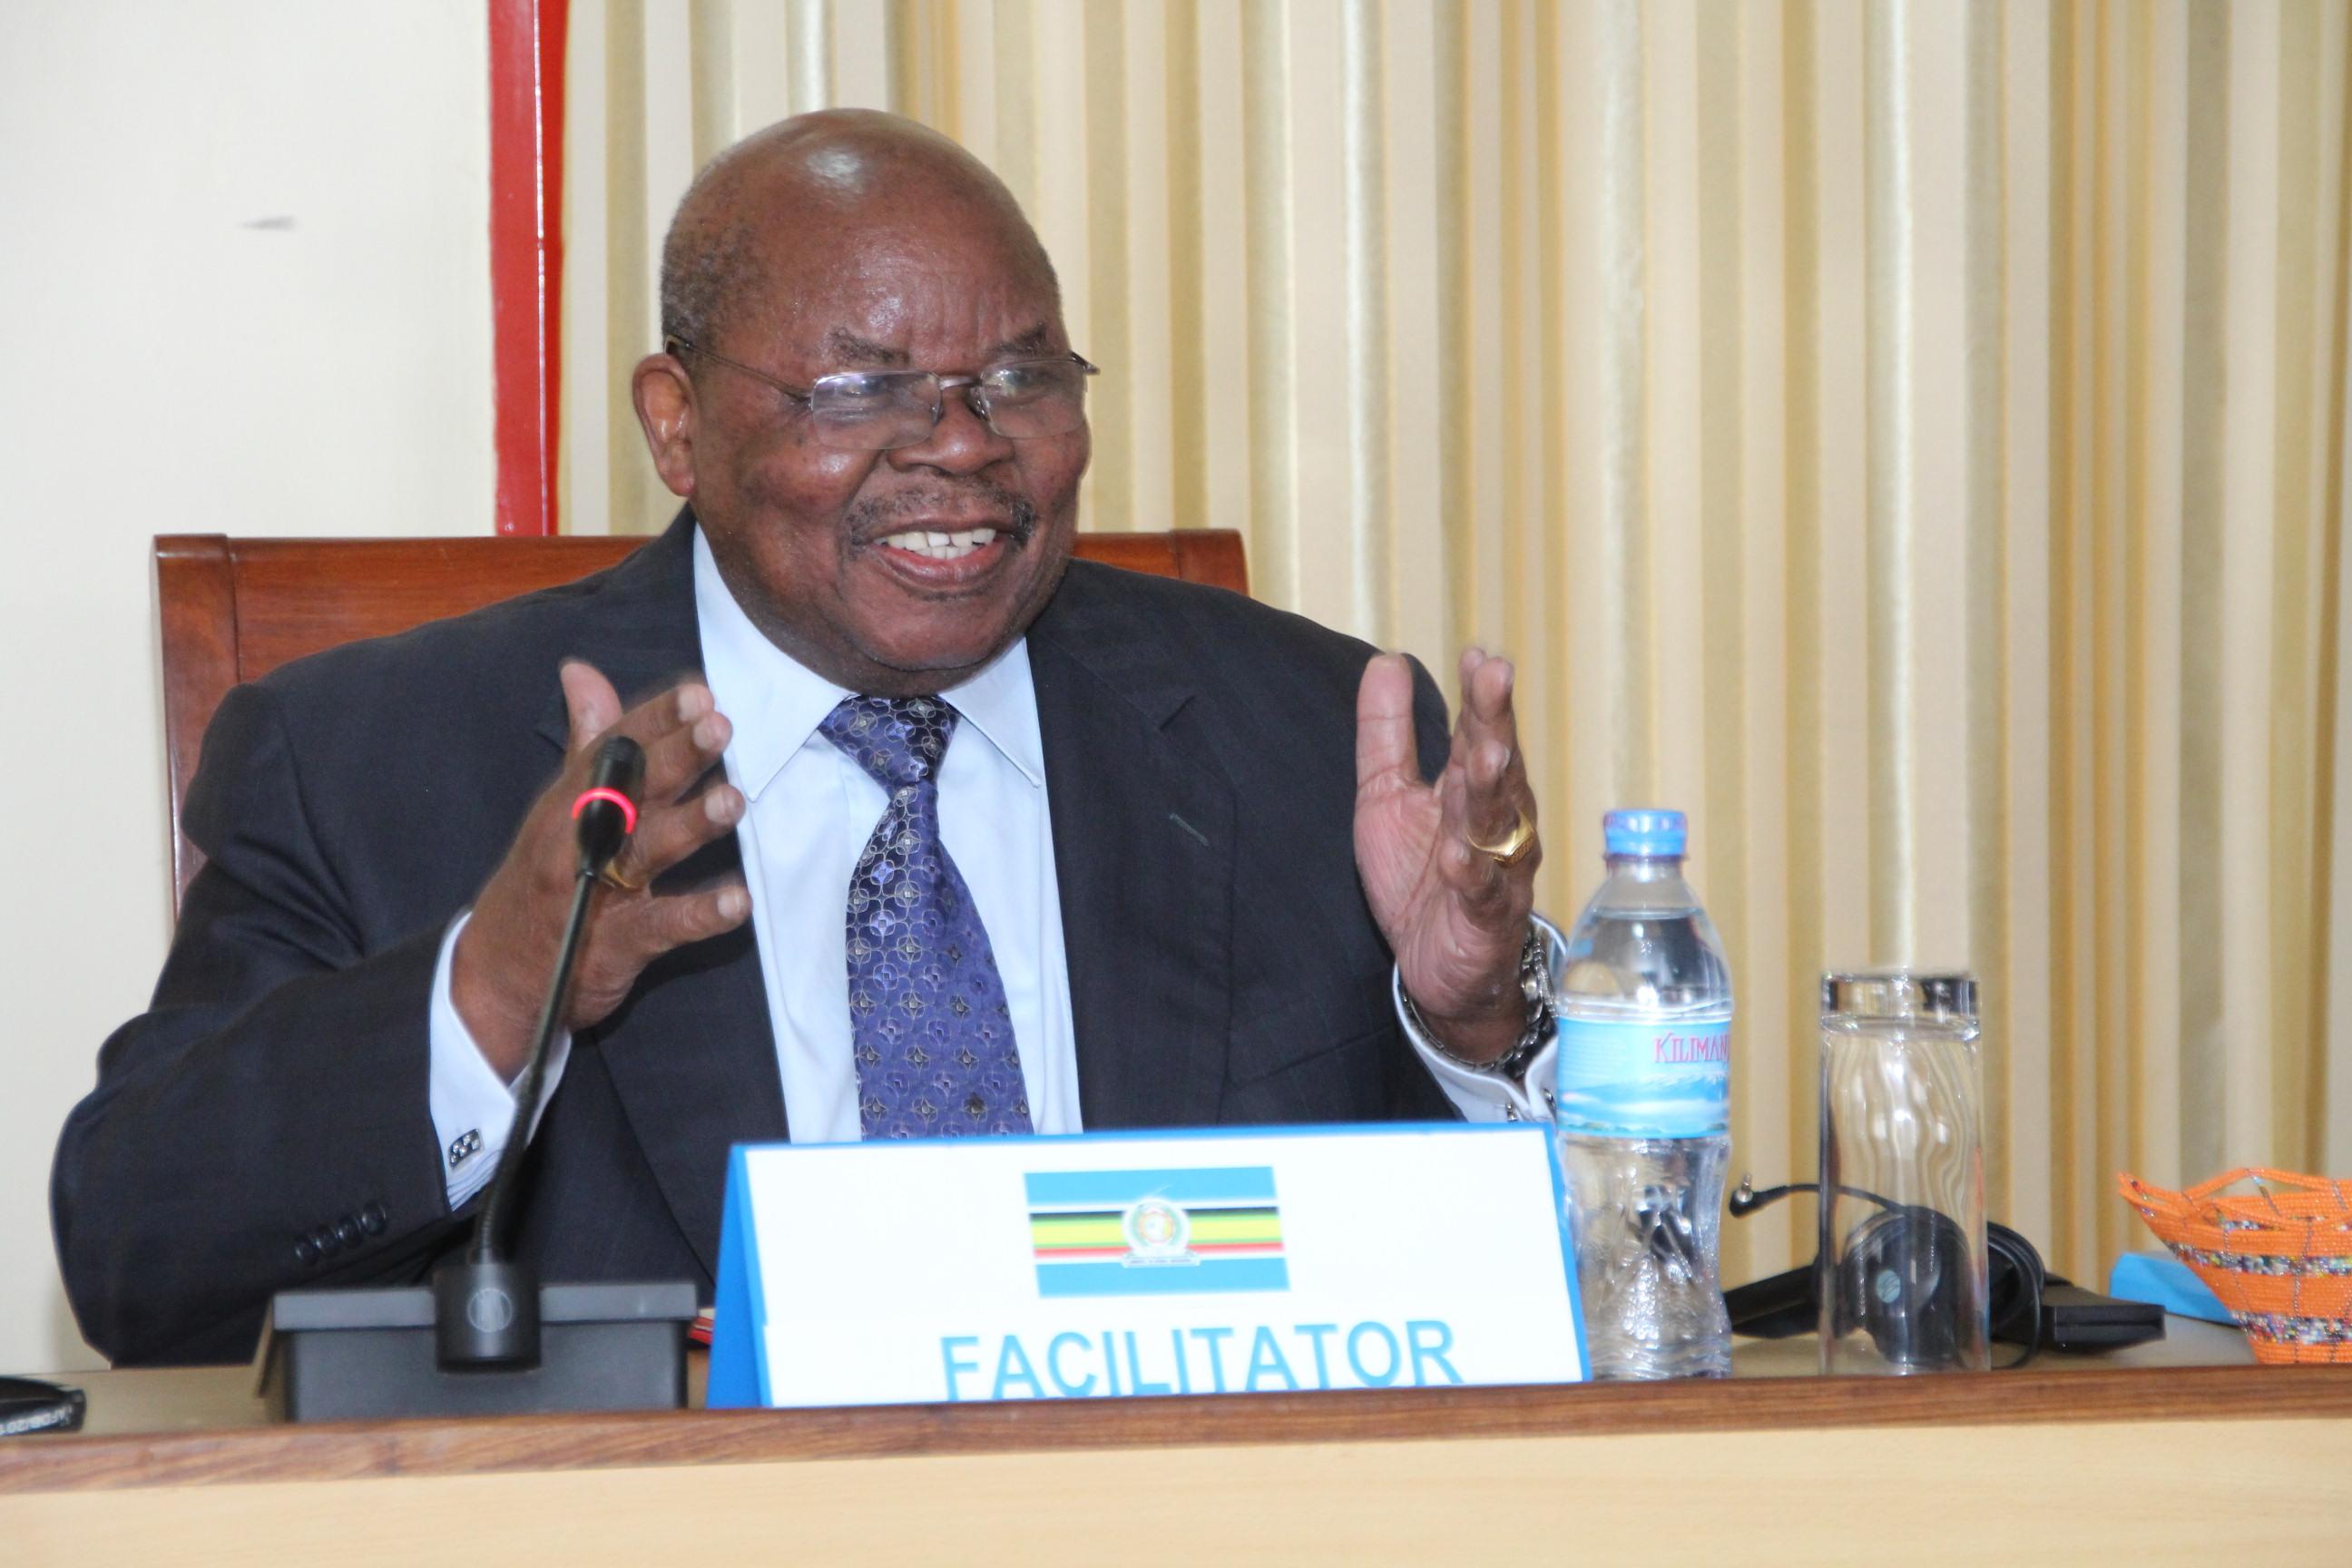 FACILITATOR: Former Tanzanian President Benjamin Mkapa addressing delegates at the just-concluded Inter-Burundi Dialogue